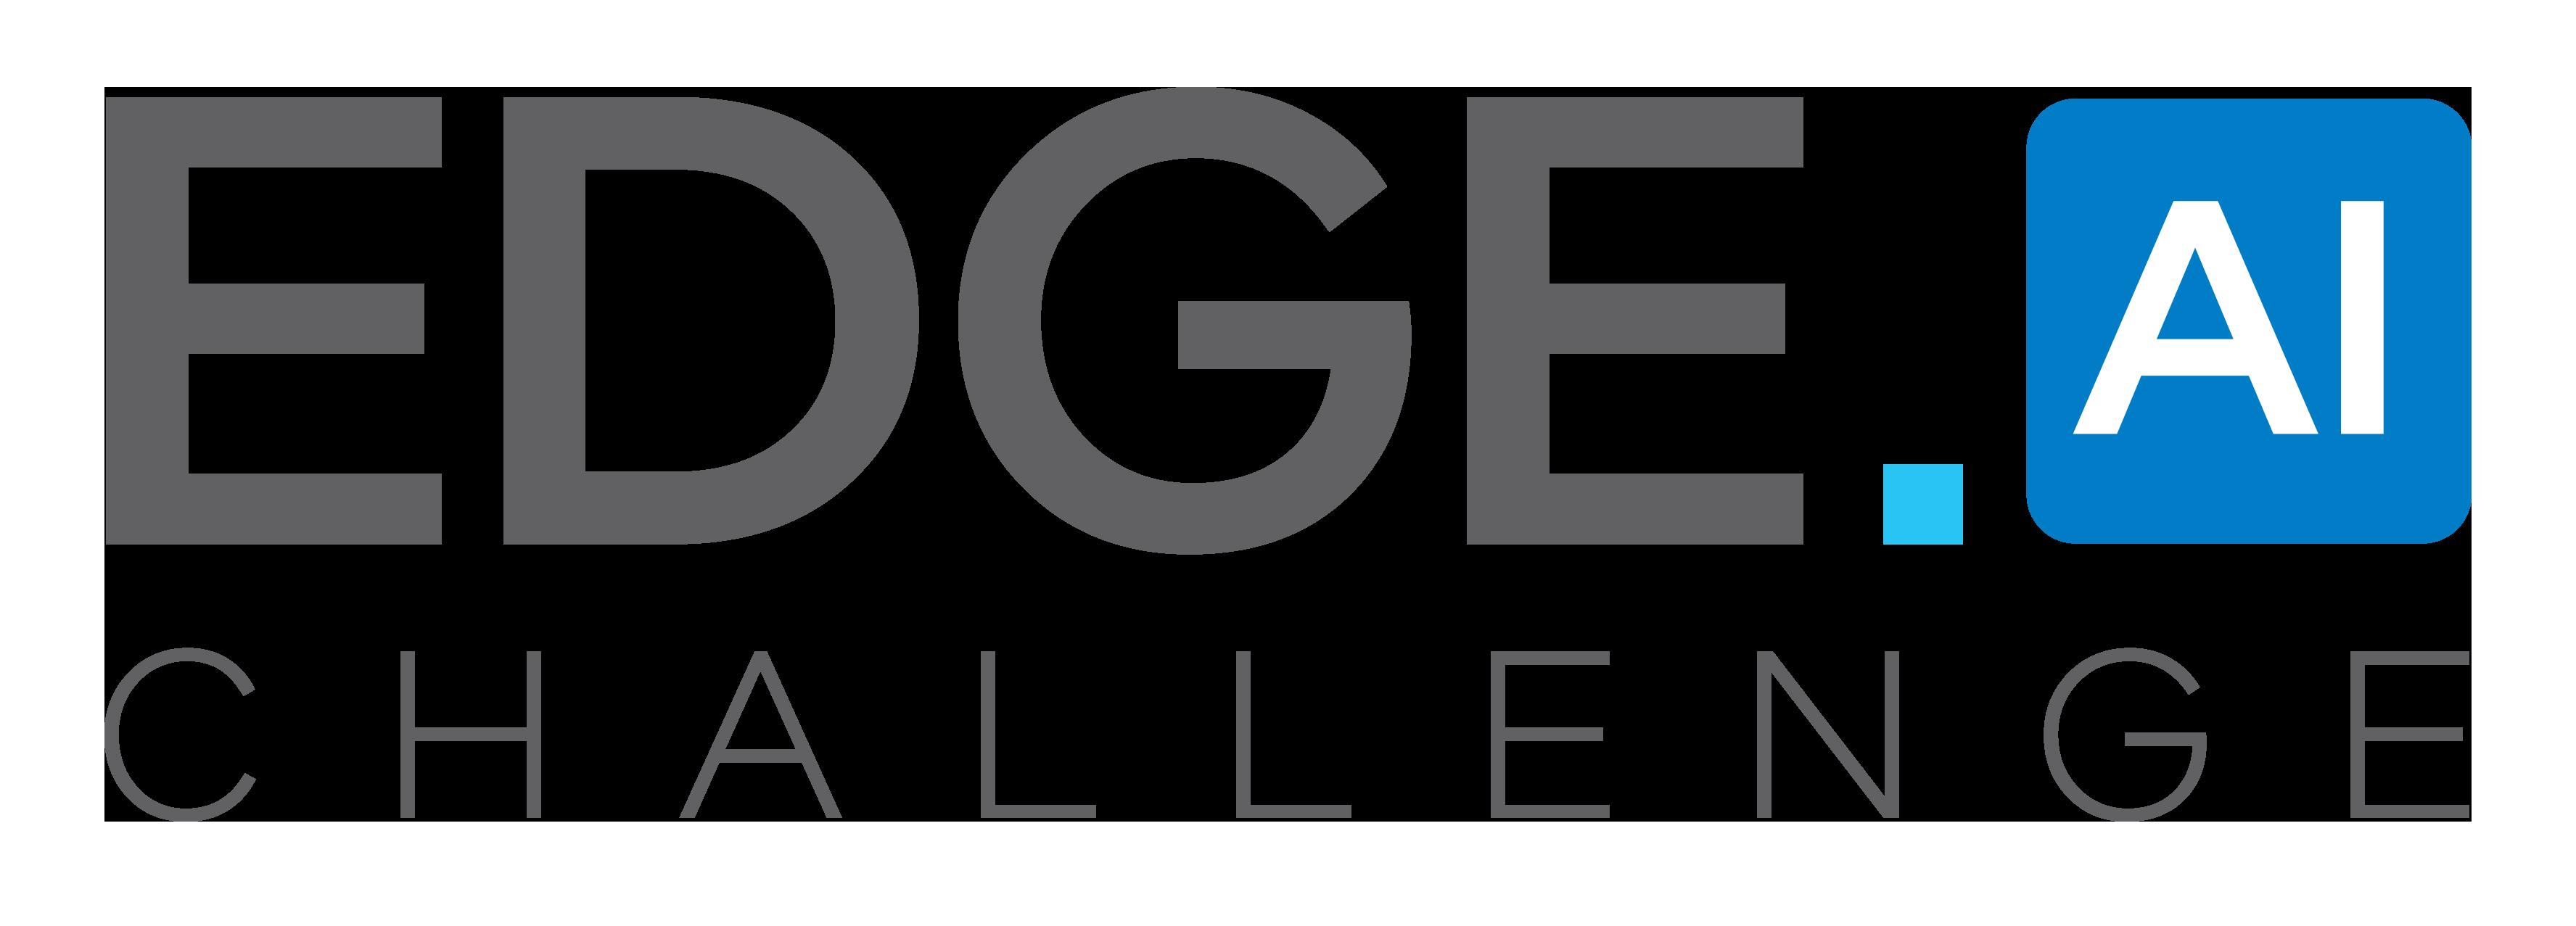 https://www.synnexmetrodata.com/wp-content/uploads/2021/02/Logo-Edge-AI.png